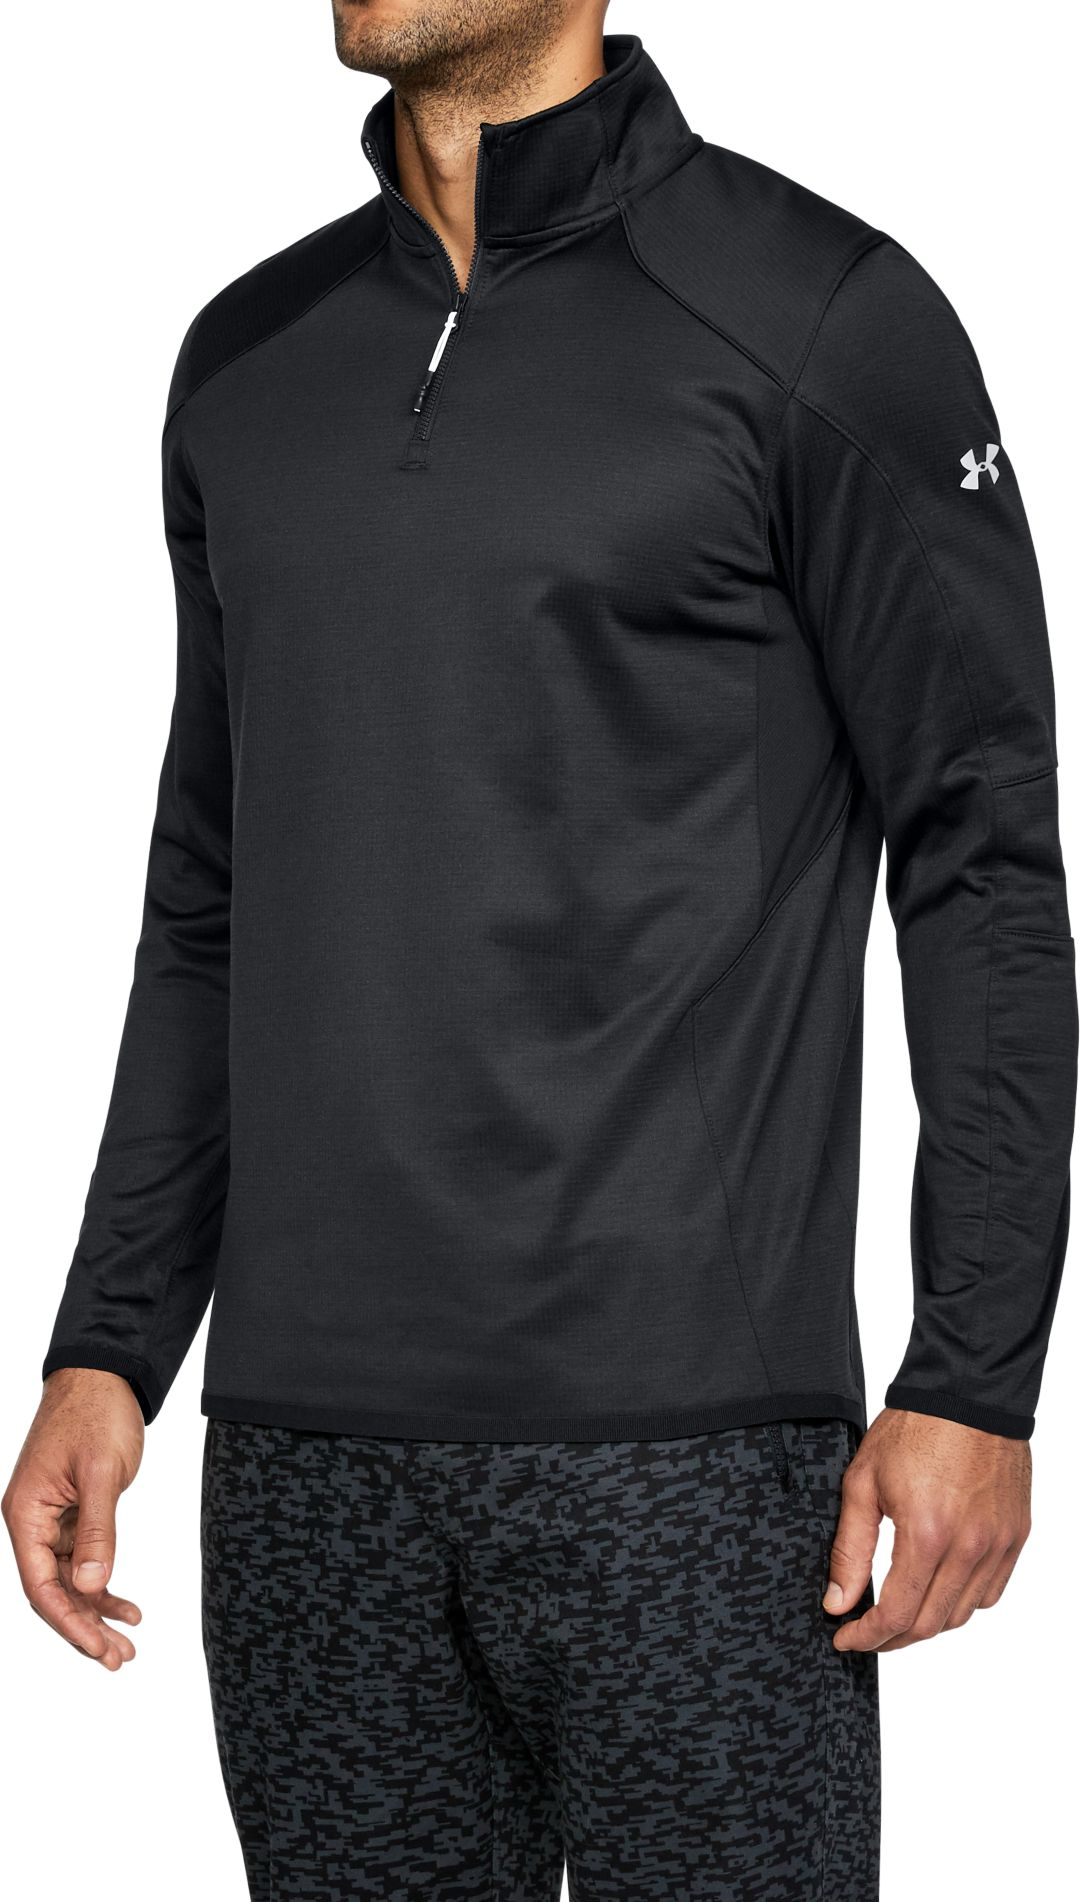 60fe429c Under Armour Men's ColdGear Reactor 1/4 Zip Long Sleeve T-Shirt